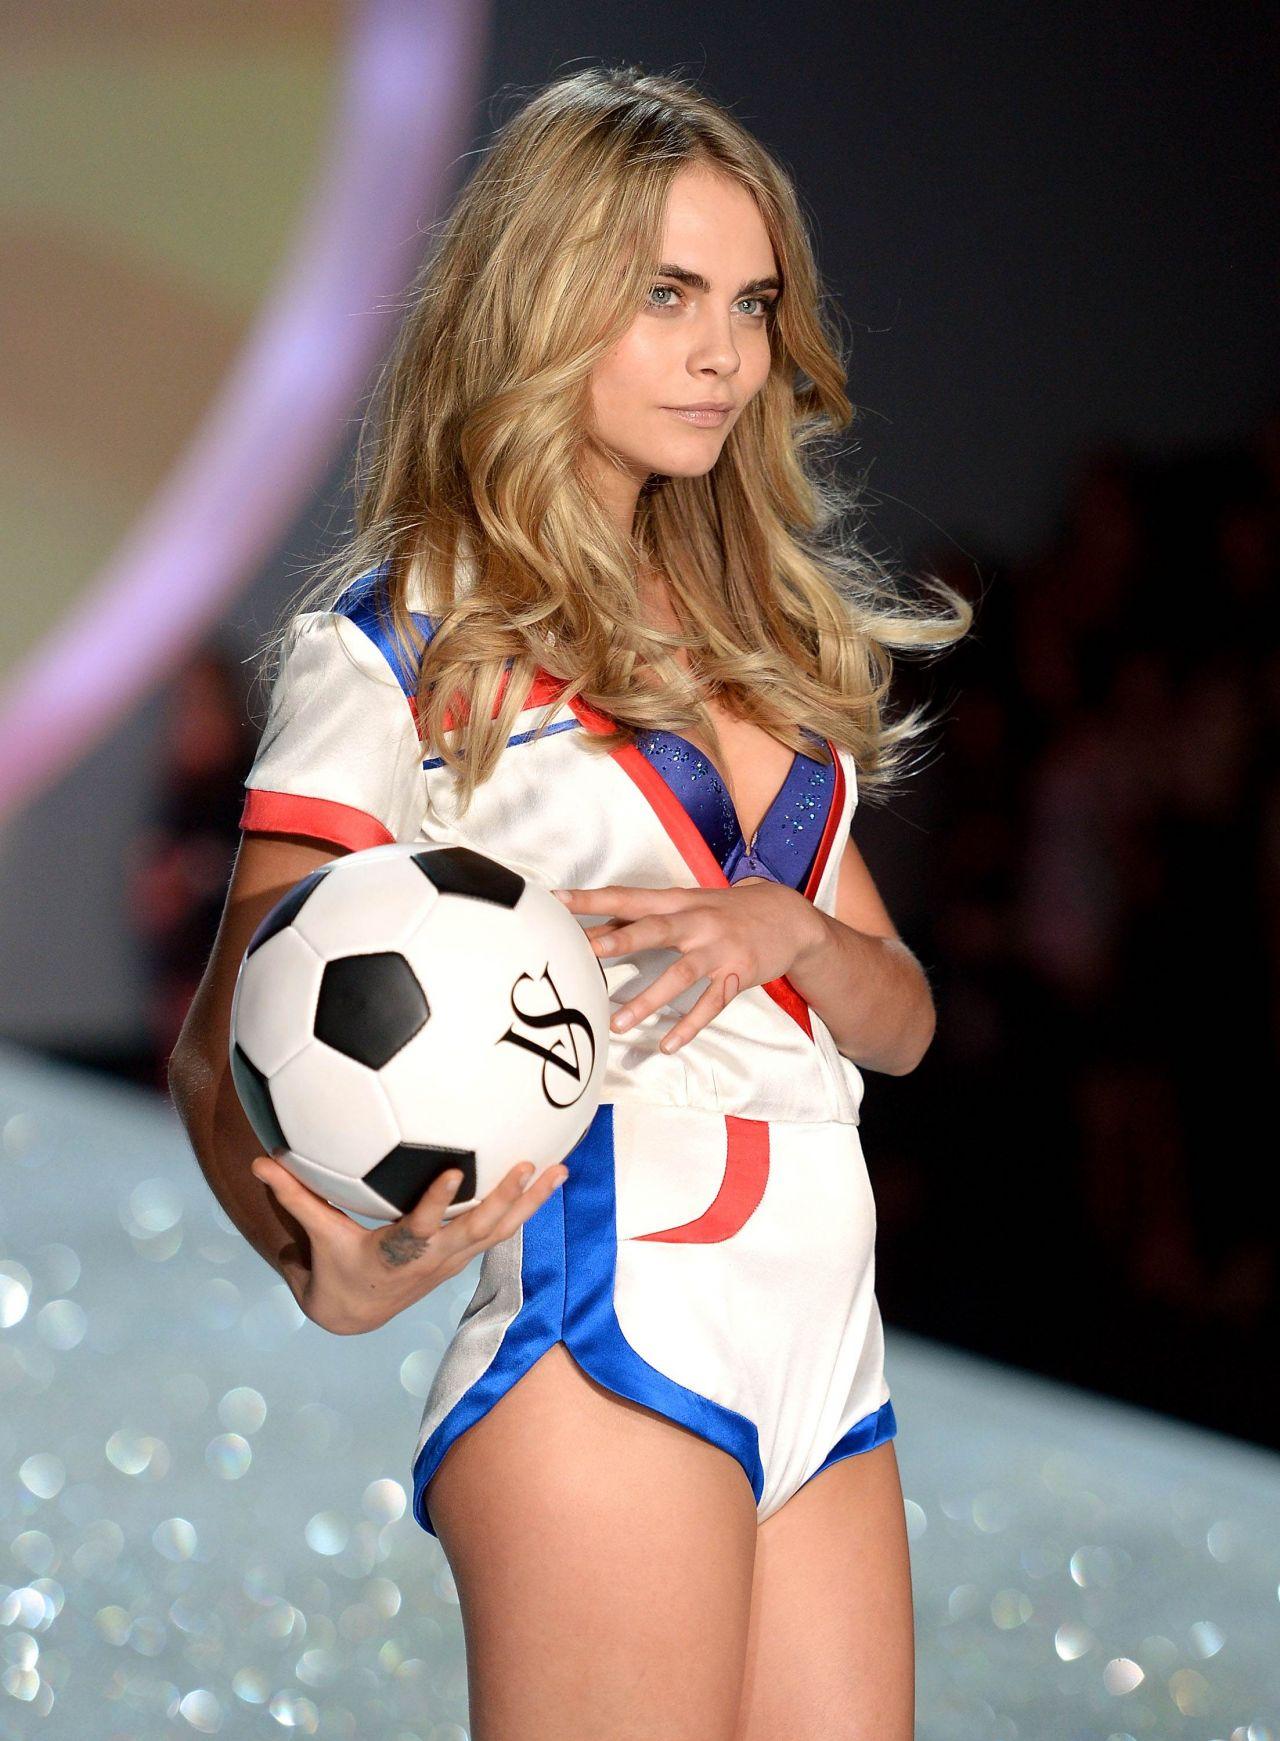 Cara Delevingne - Victoria's Secret Fashion Show - Runway, New York City